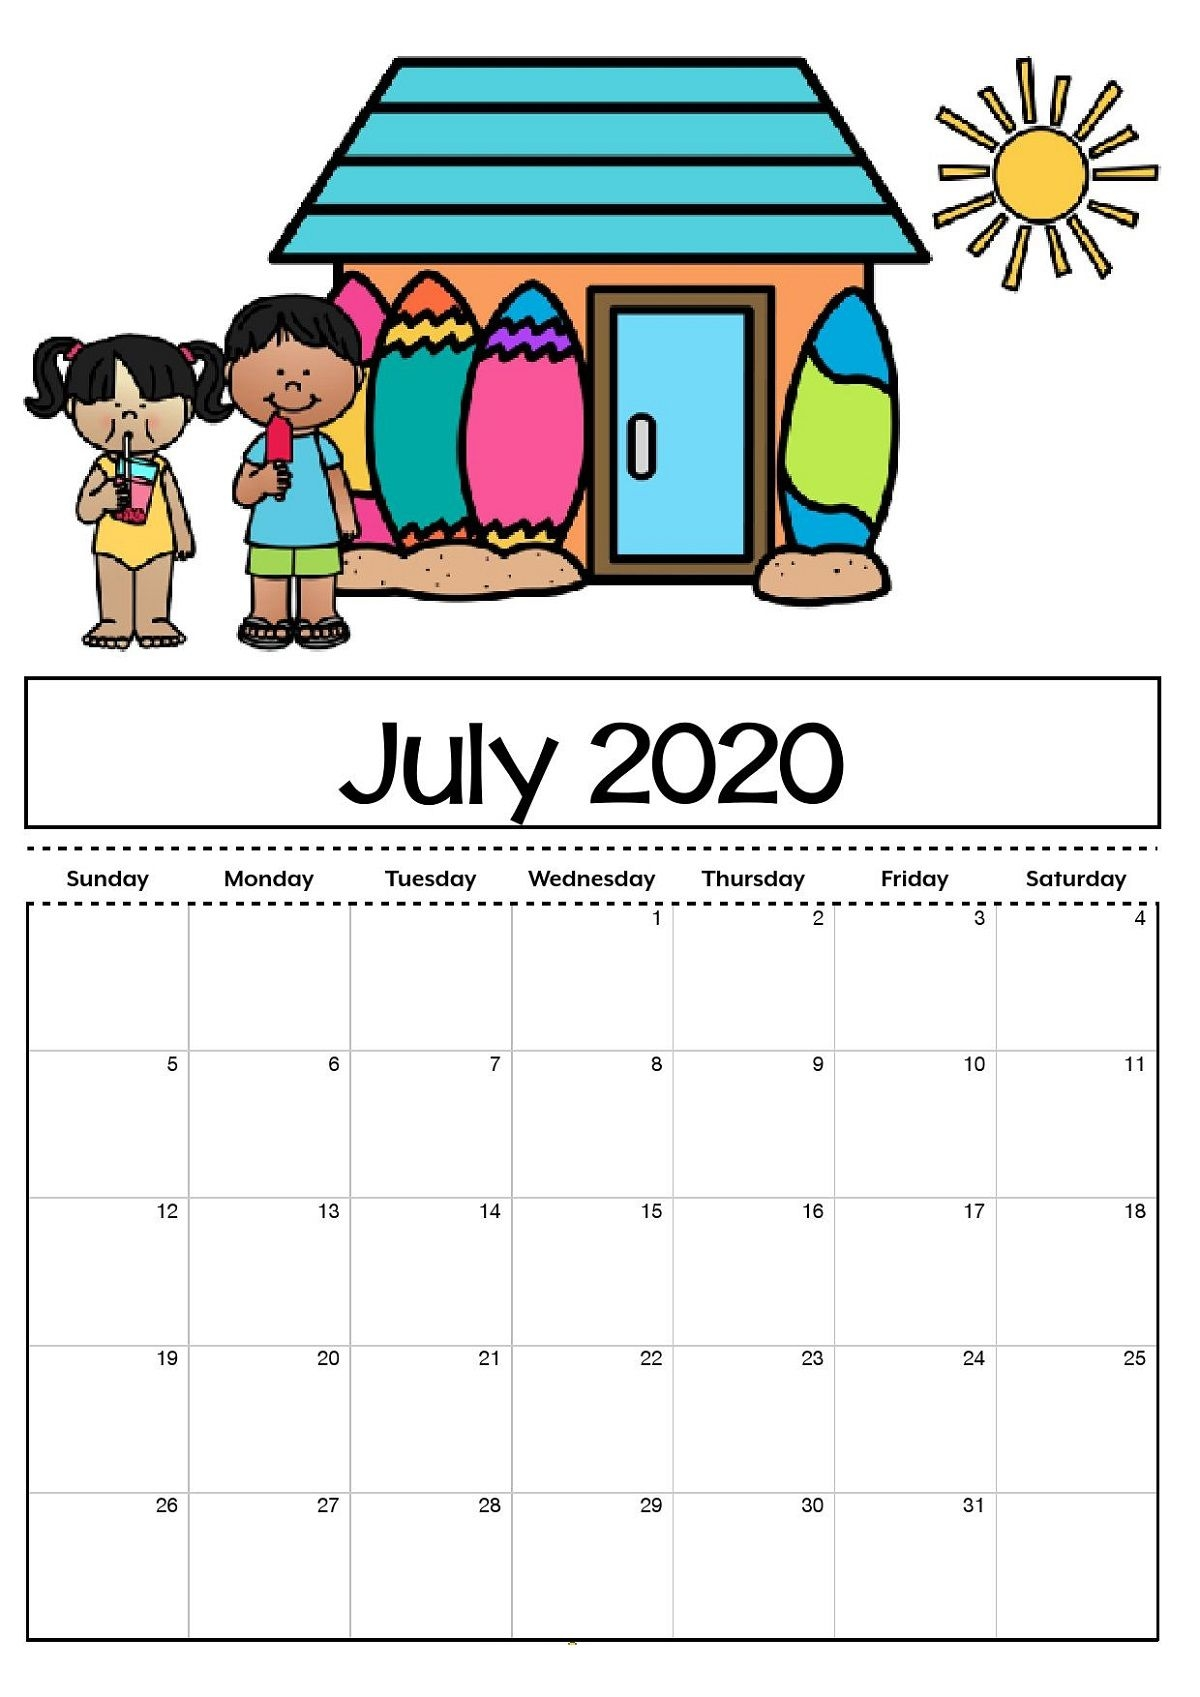 Calendar Template For Kids - Bance